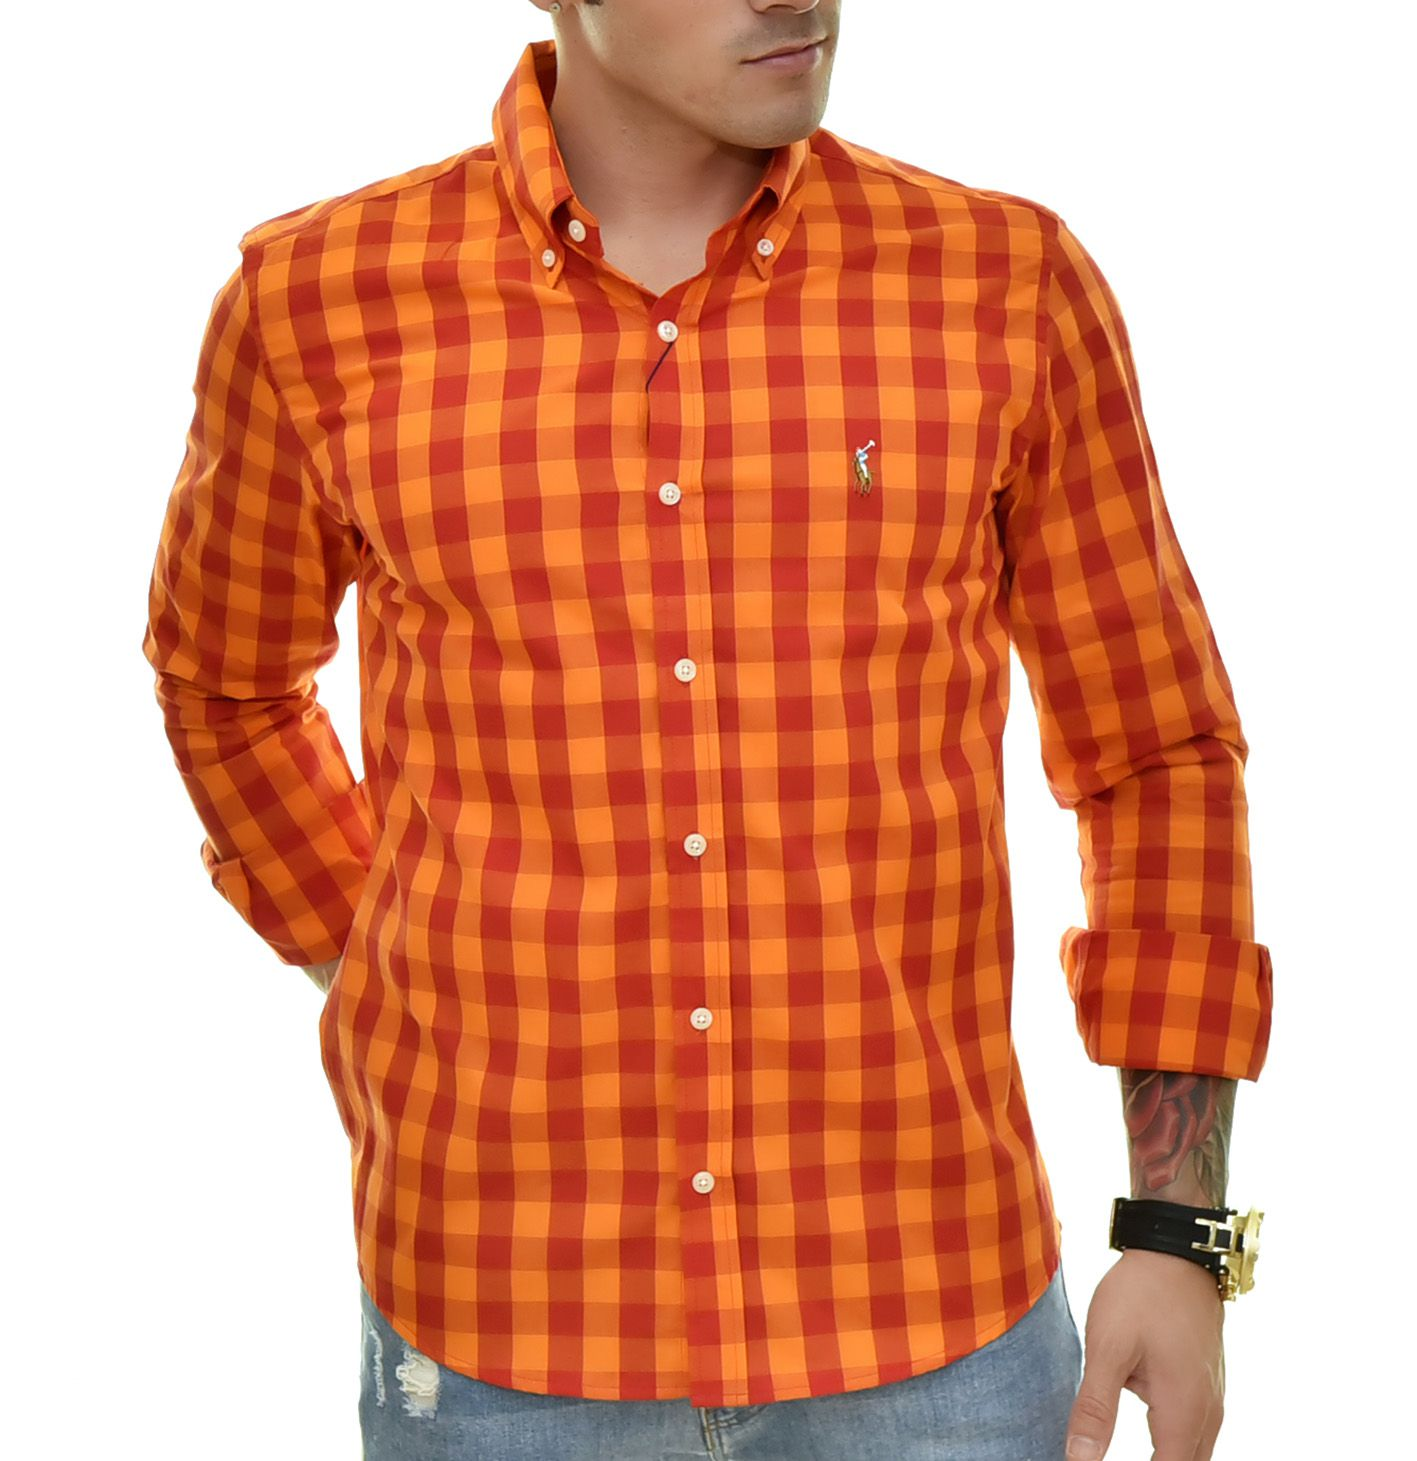 Camisa Social RL Xadrez LRJ-VRM Colored - Custom Fit  - Ca Brasileira